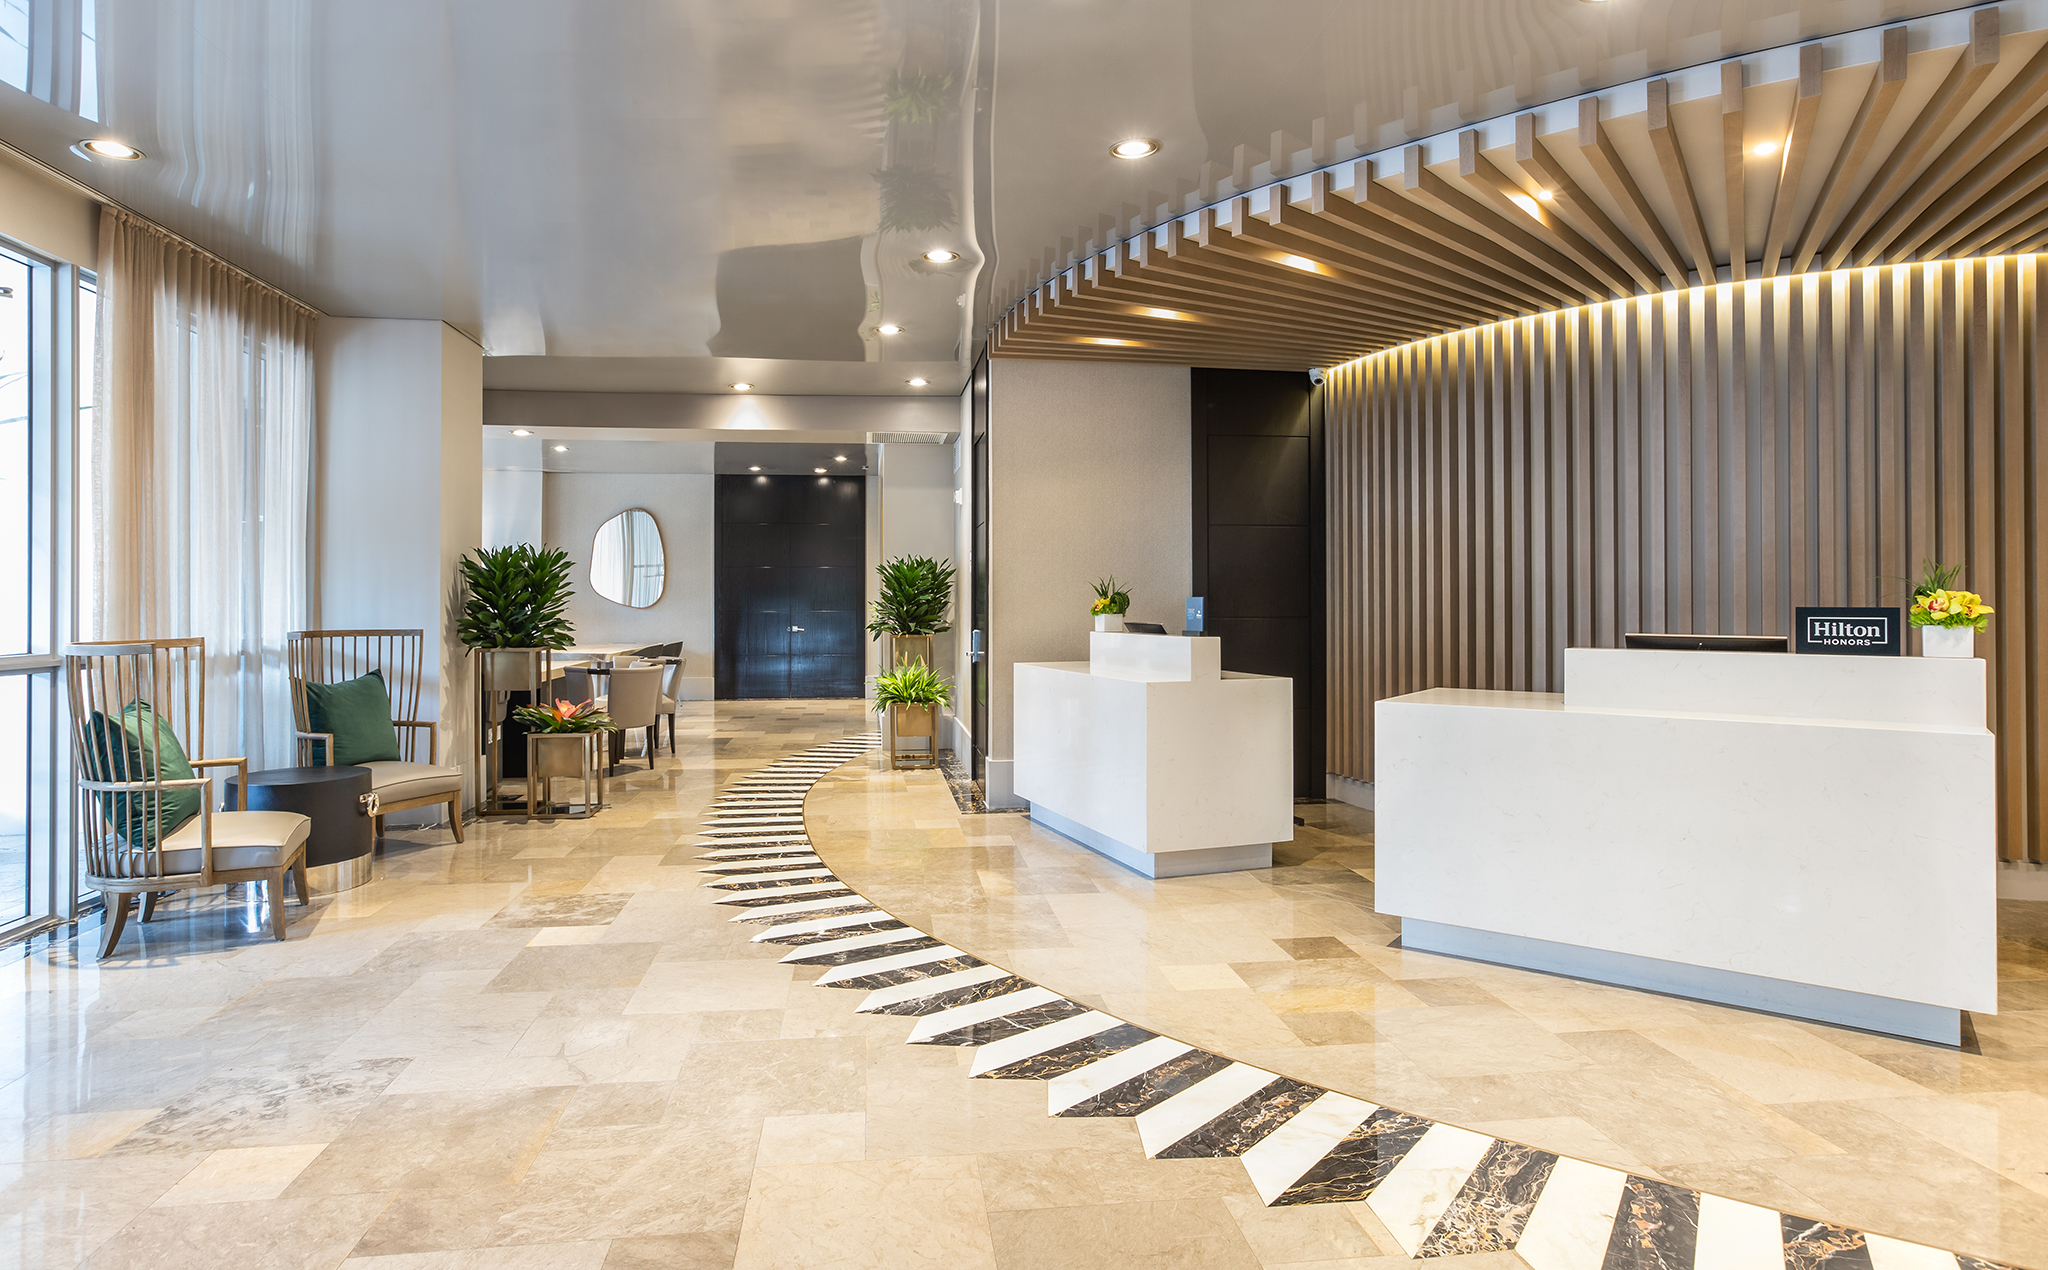 Hilton Bentley Miami South Beach Hotel Lobby 3